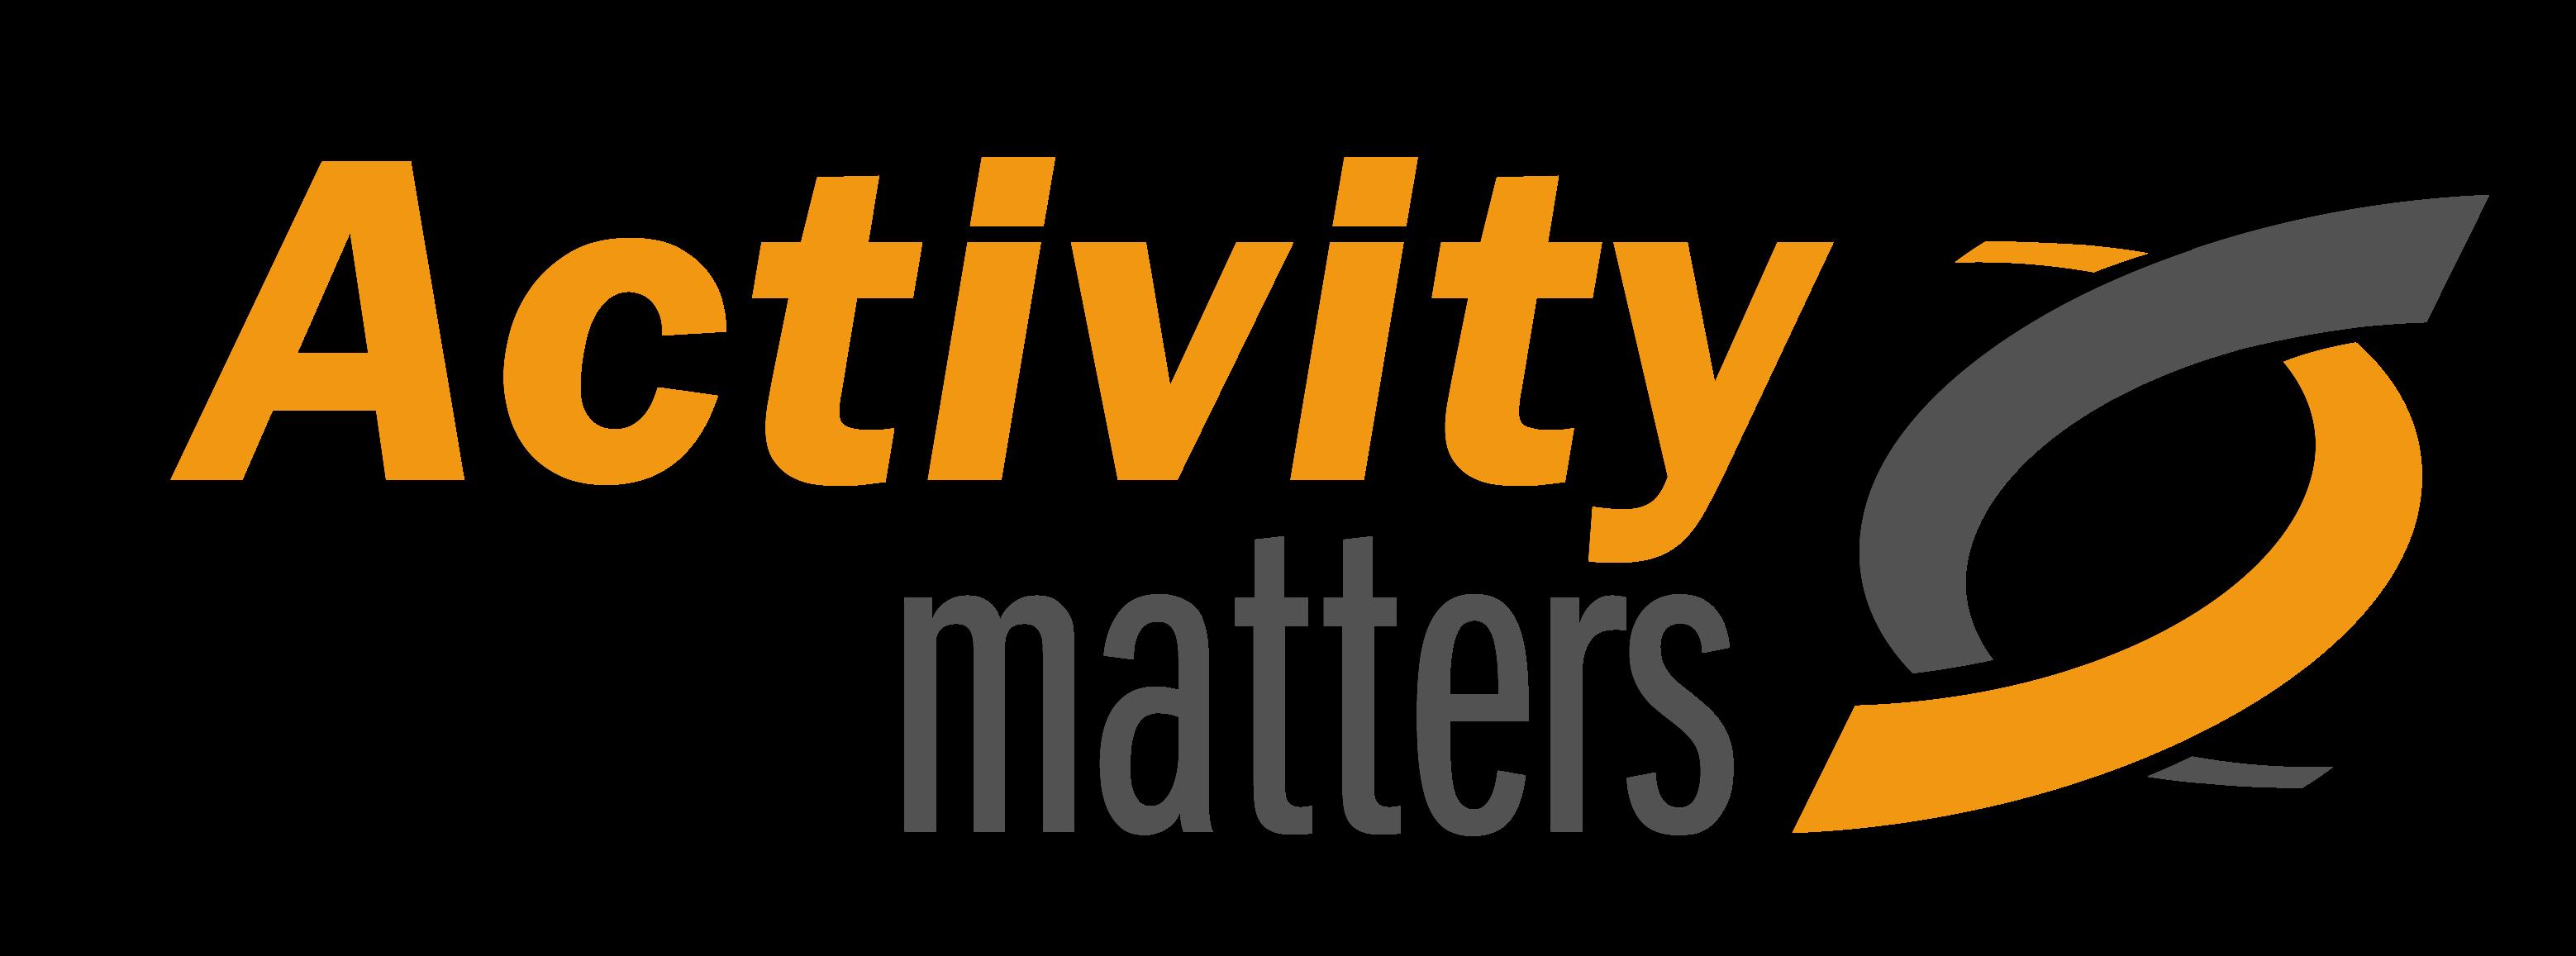 Activity-Matters